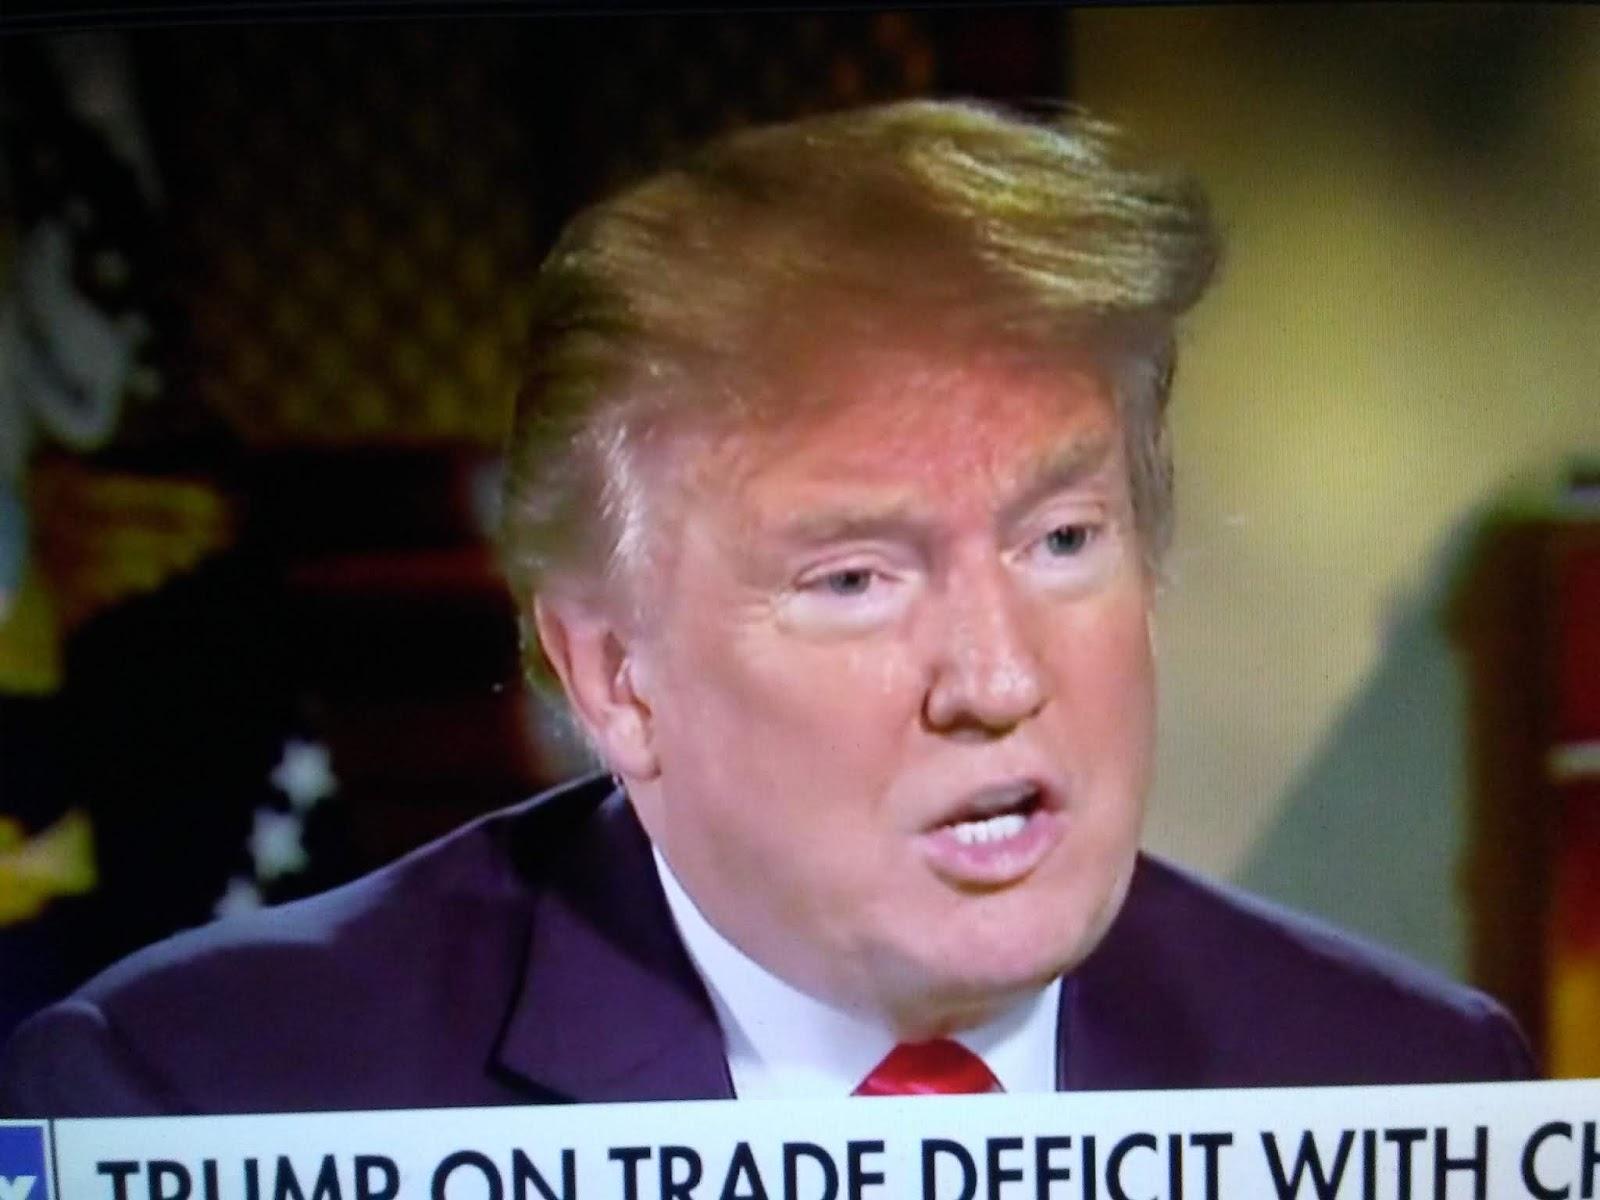 Trump Slams Difficult European Union On Trade, Calls 28 Nation Bloc